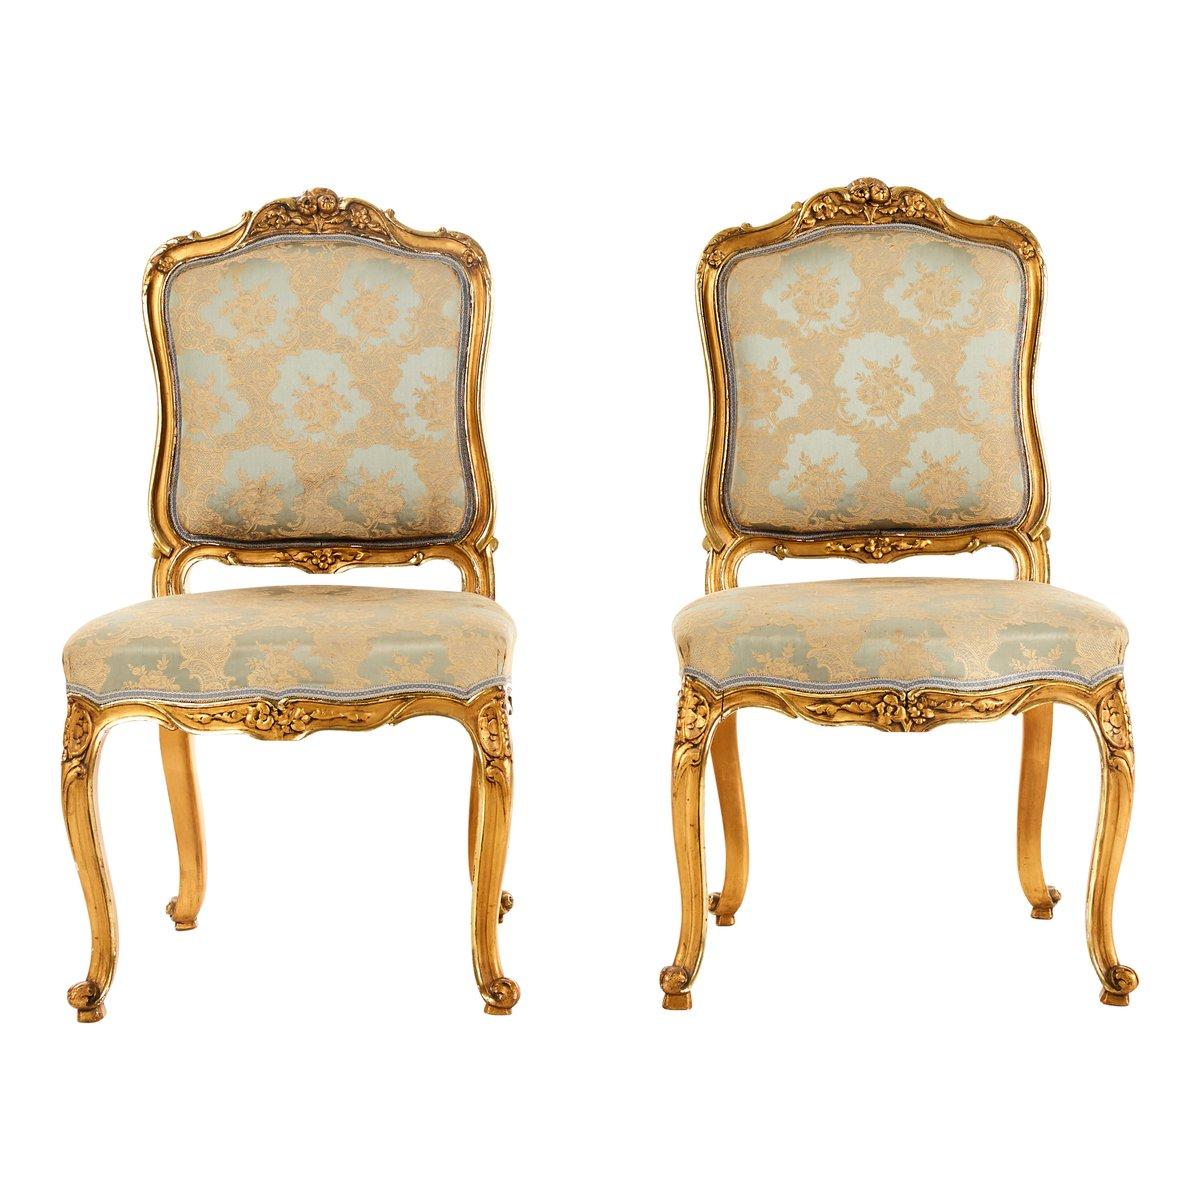 Antike Stuhle Im Louis Xv Stil 2er Set Bei Pamono Kaufen